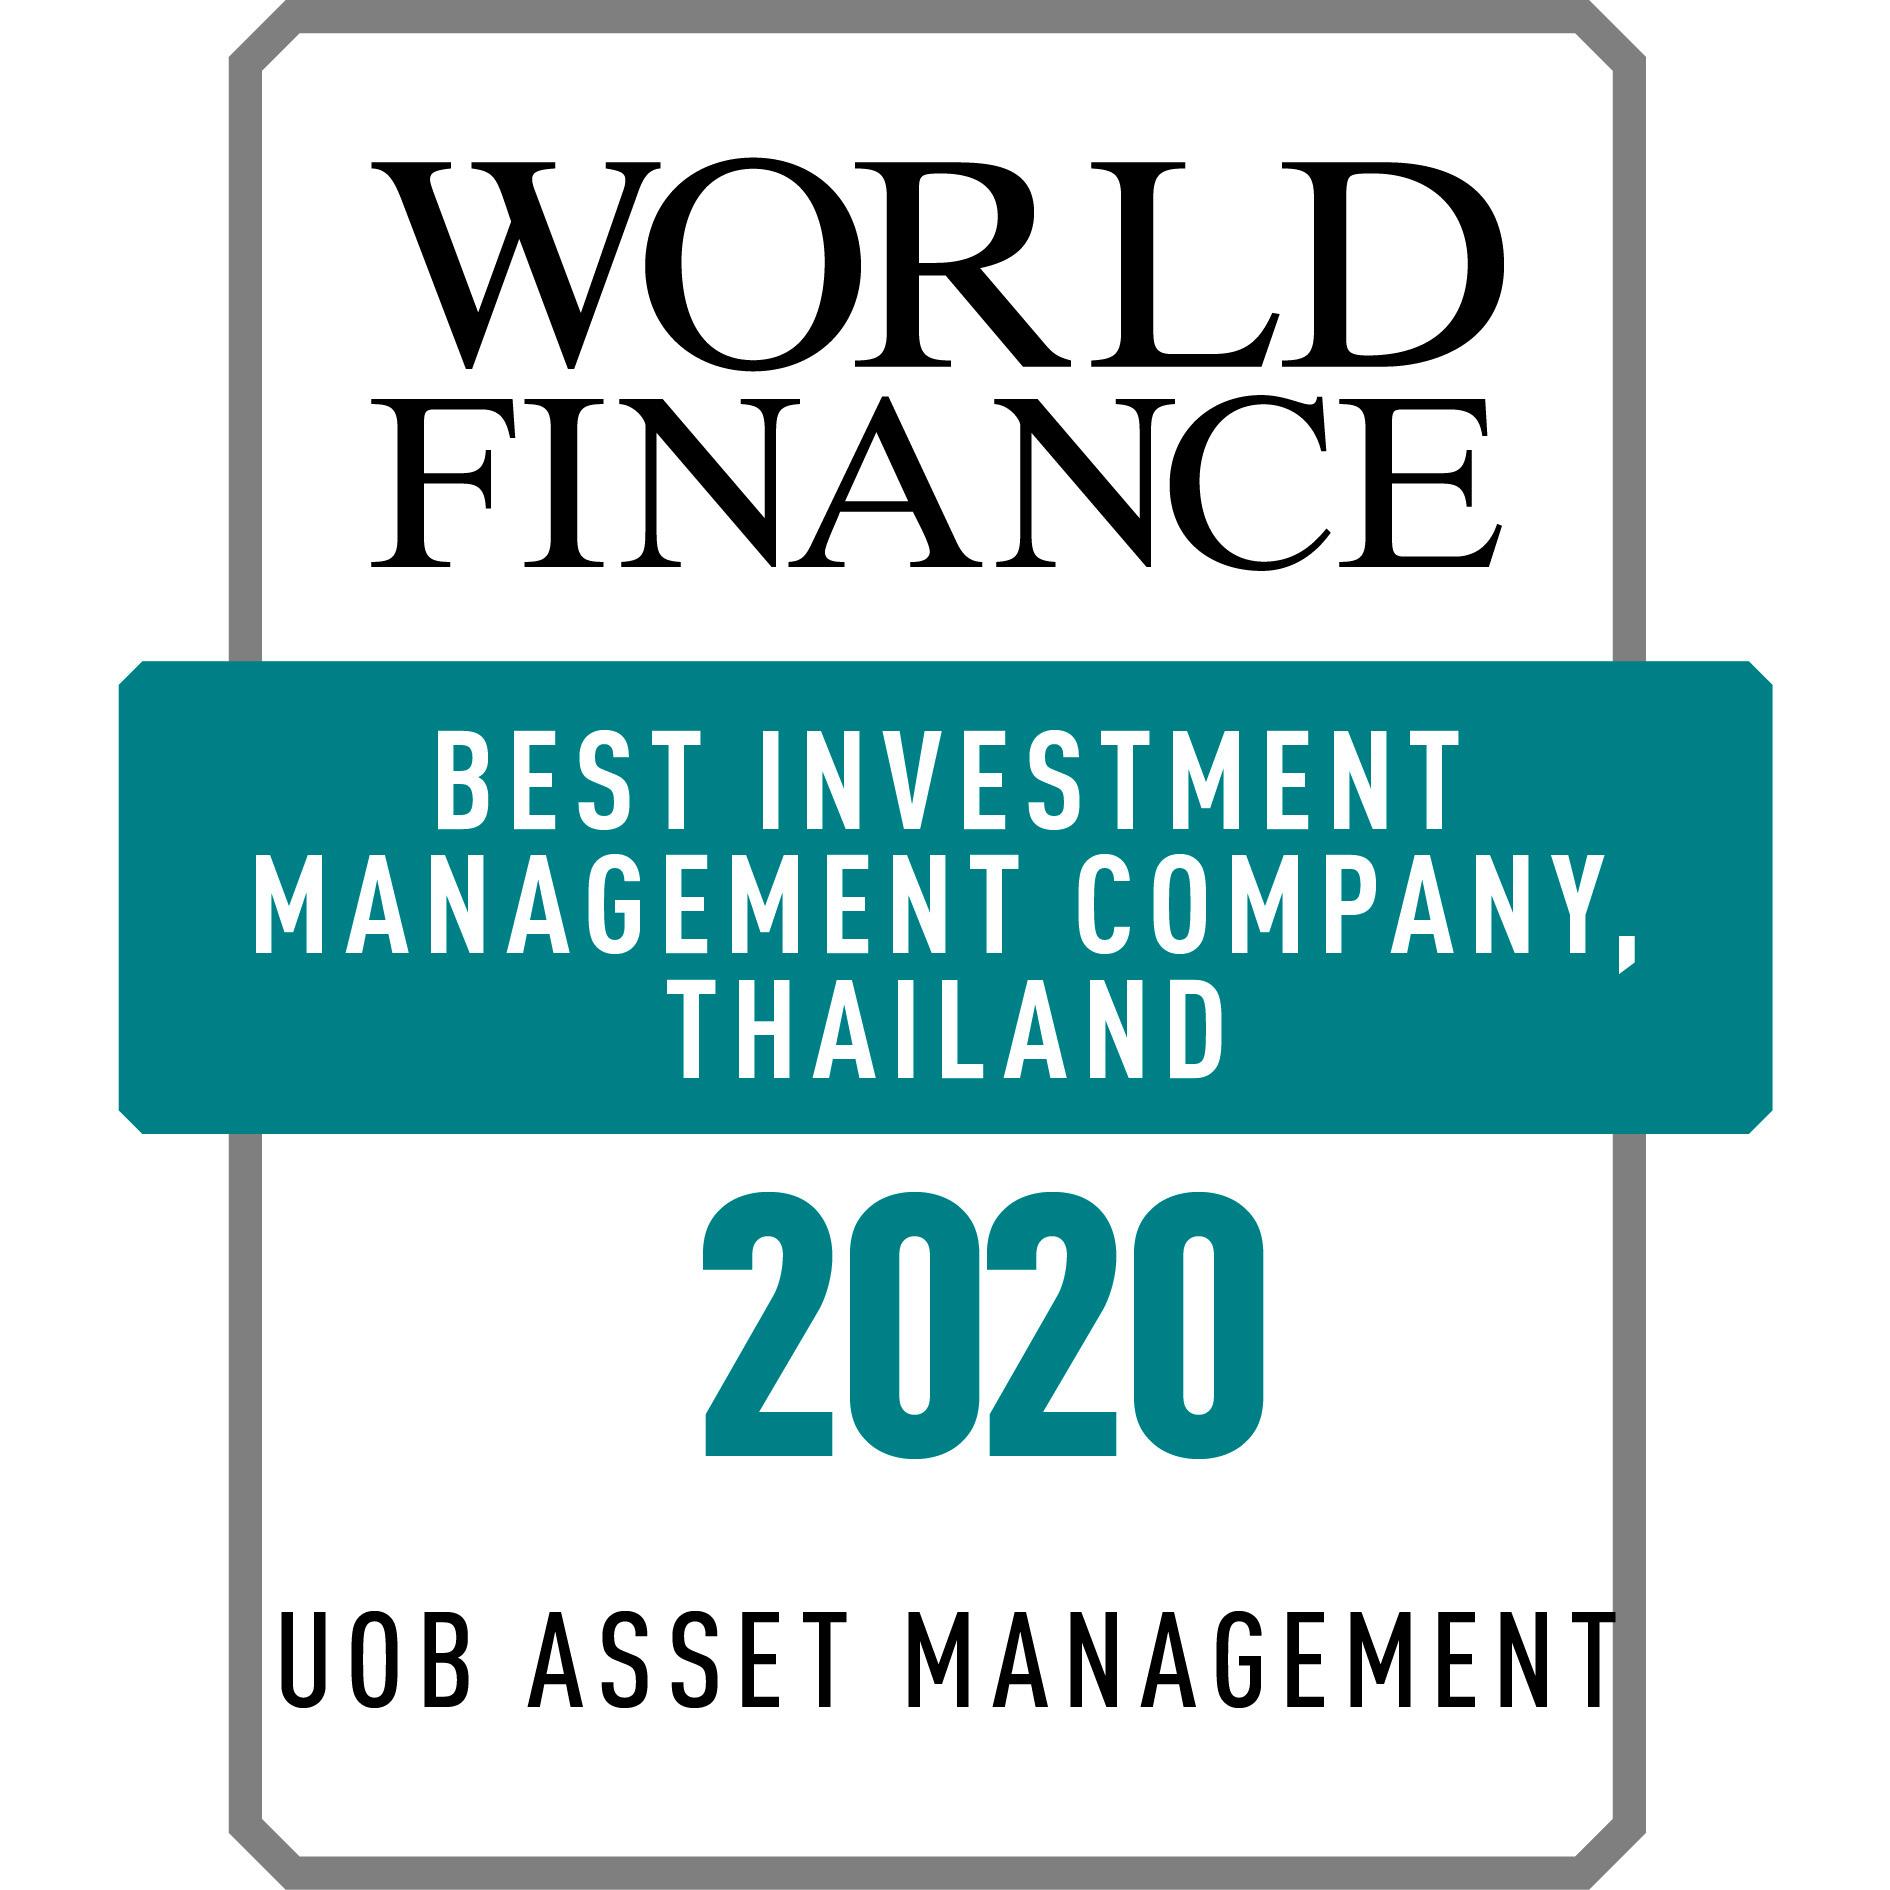 World Finance 2020 : Best Investment Management Company, Thailand